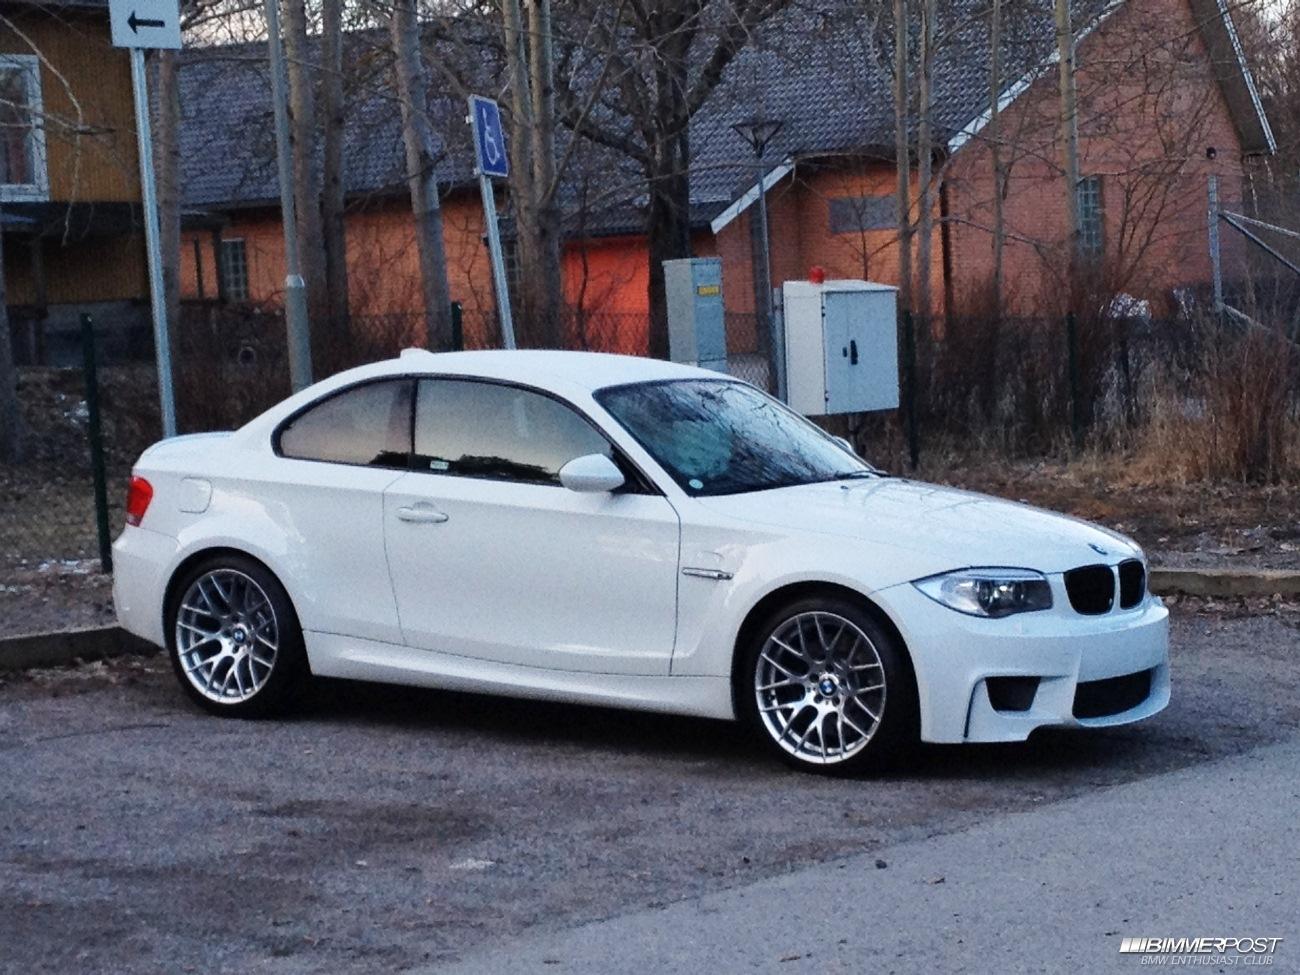 BMW 1M I (E82) 2011 - now Coupe #2